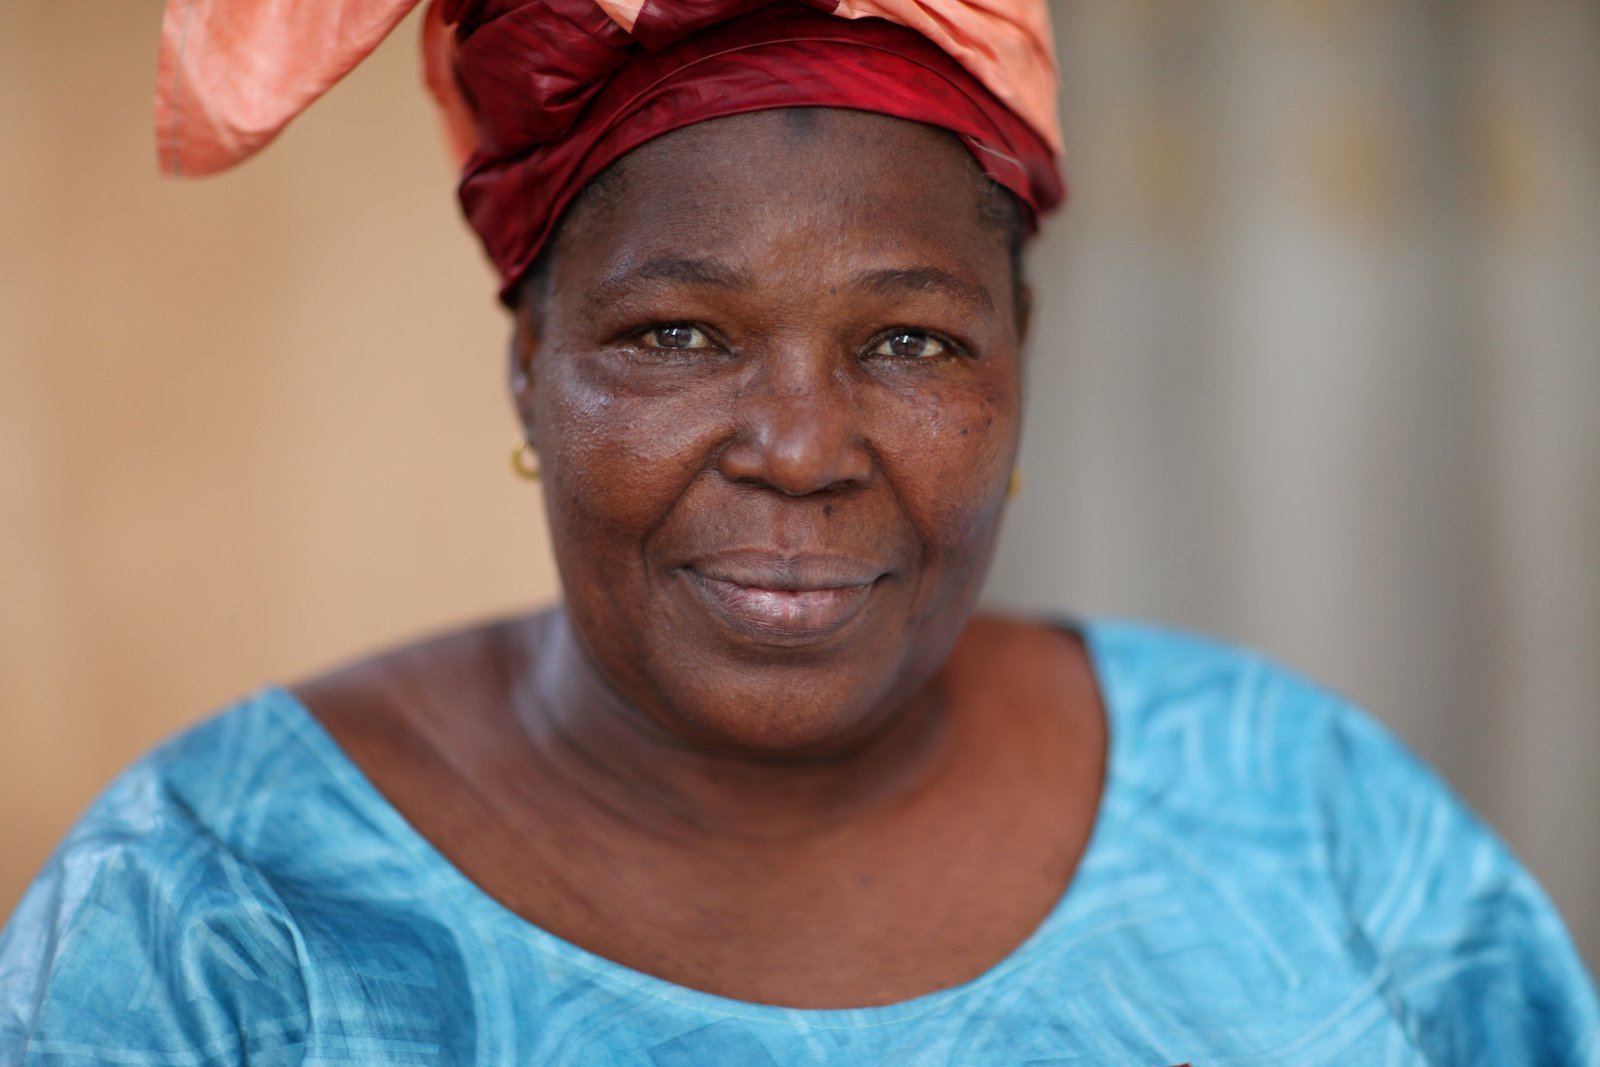 Malian singer Bako Dagno